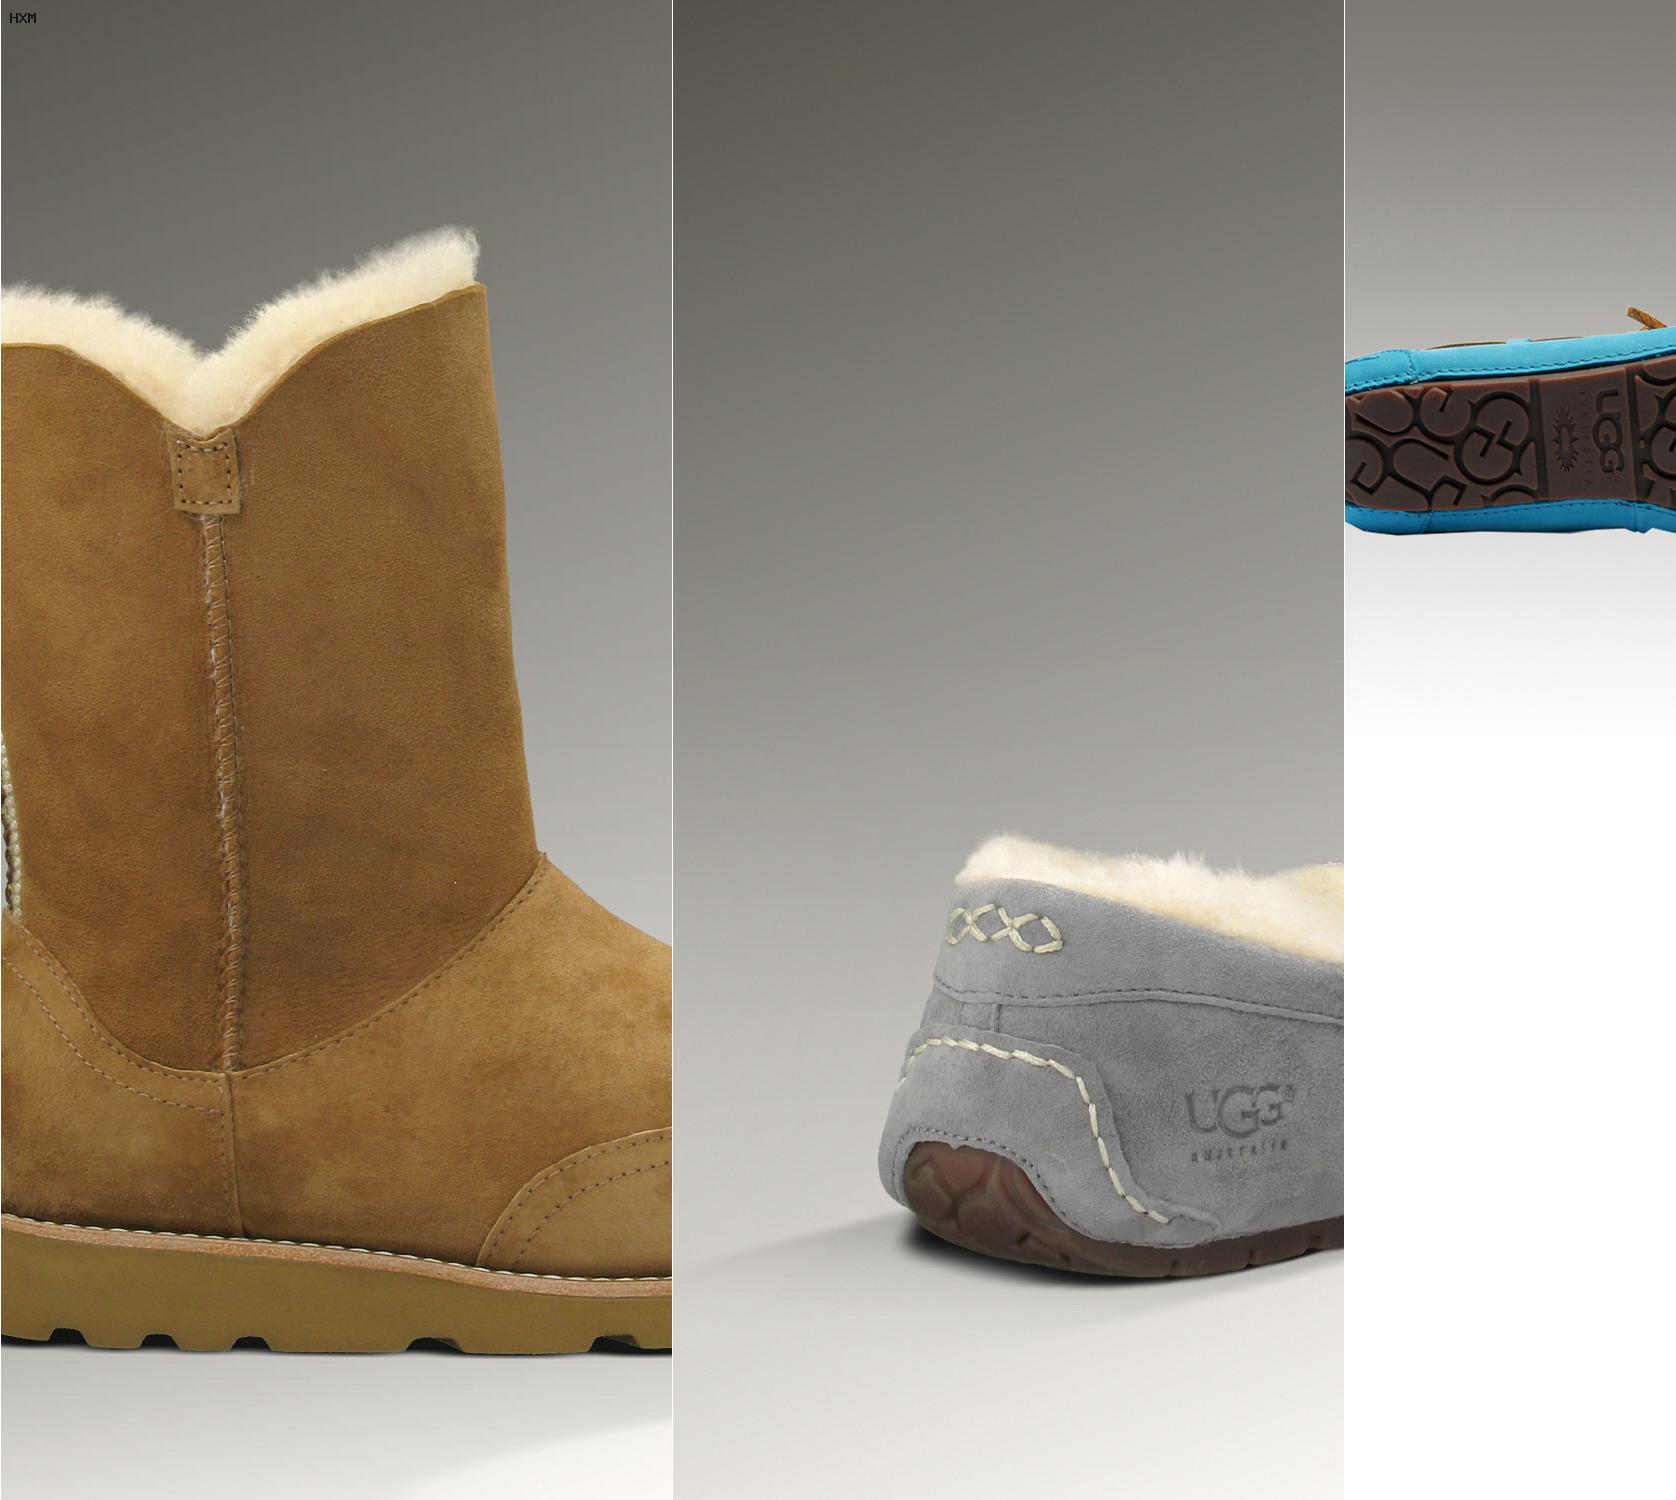 botas para invierno ugg